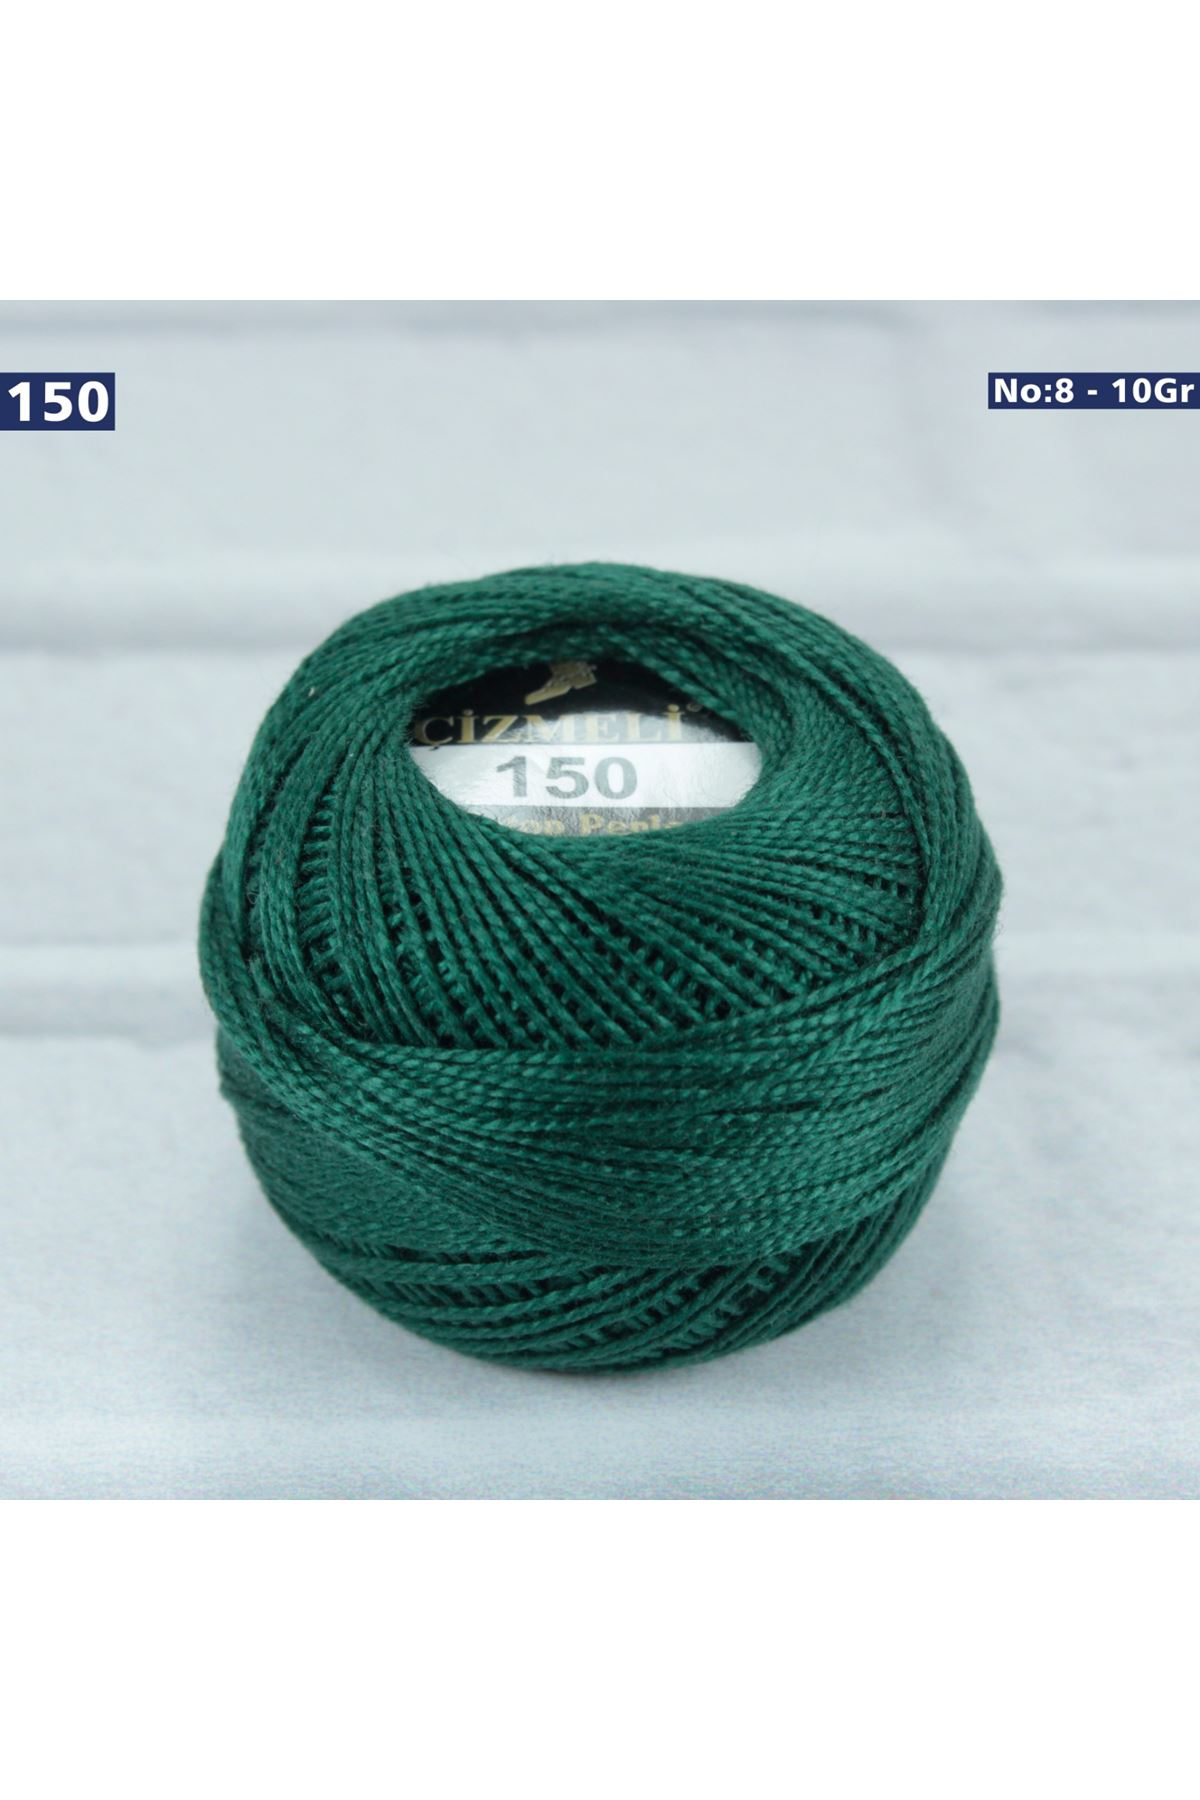 Çizmeli Cotton Perle Nakış İpliği No: 150